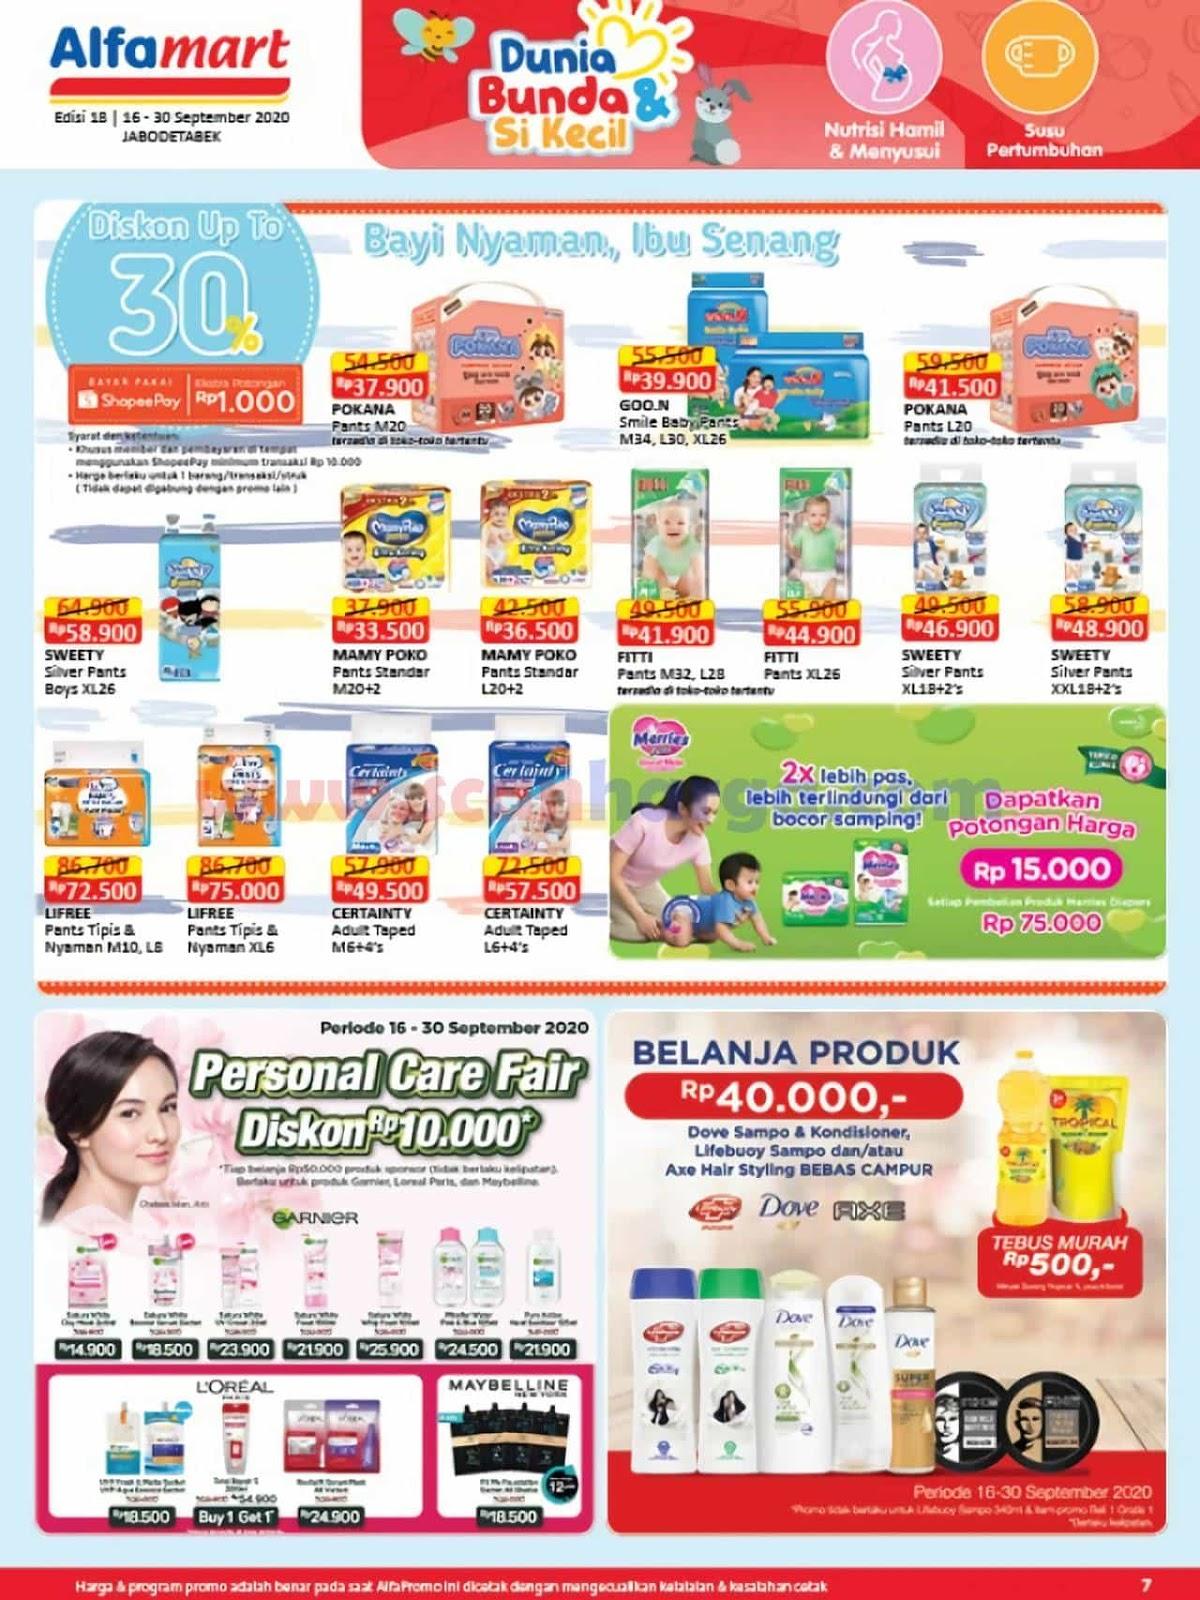 Katalog Promo Alfamart 16 - 30 September 2020 7